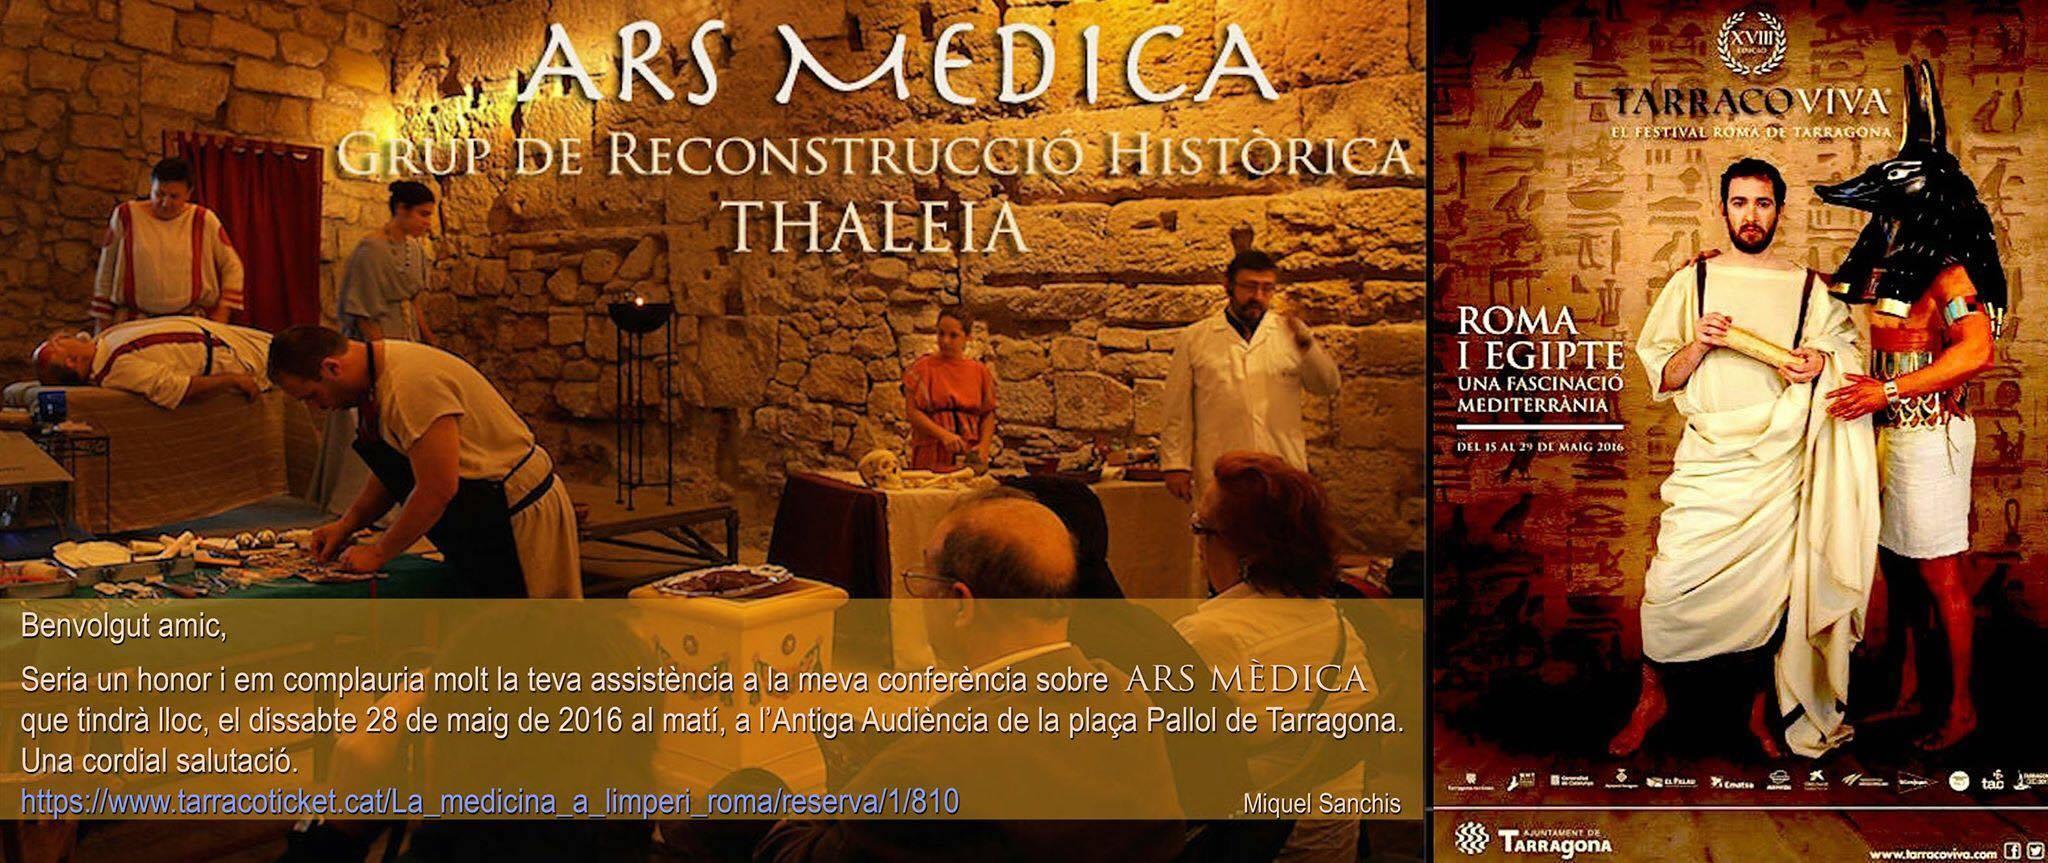 Tarraco: dientes e inventos. Homenatge a Tàrraco Viva